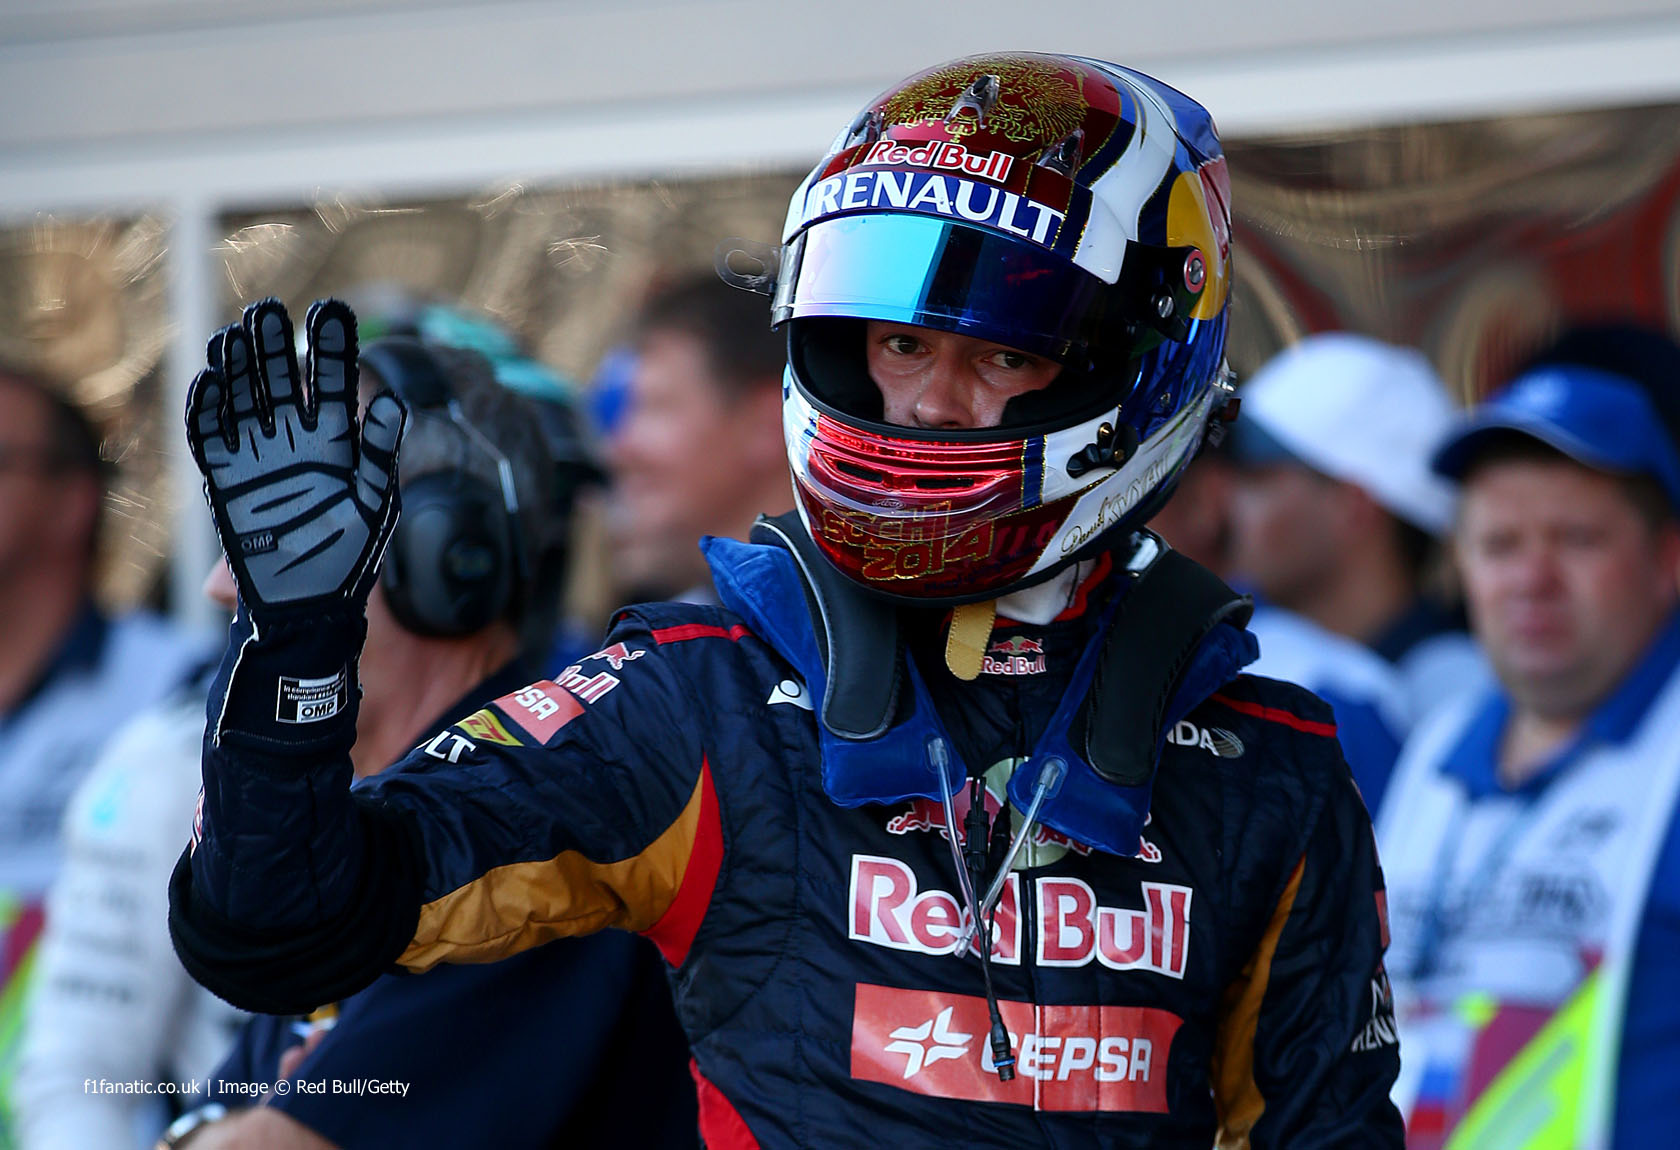 Daniil Kvyat, Toro Rosso, Sochi Autodrom, 2014